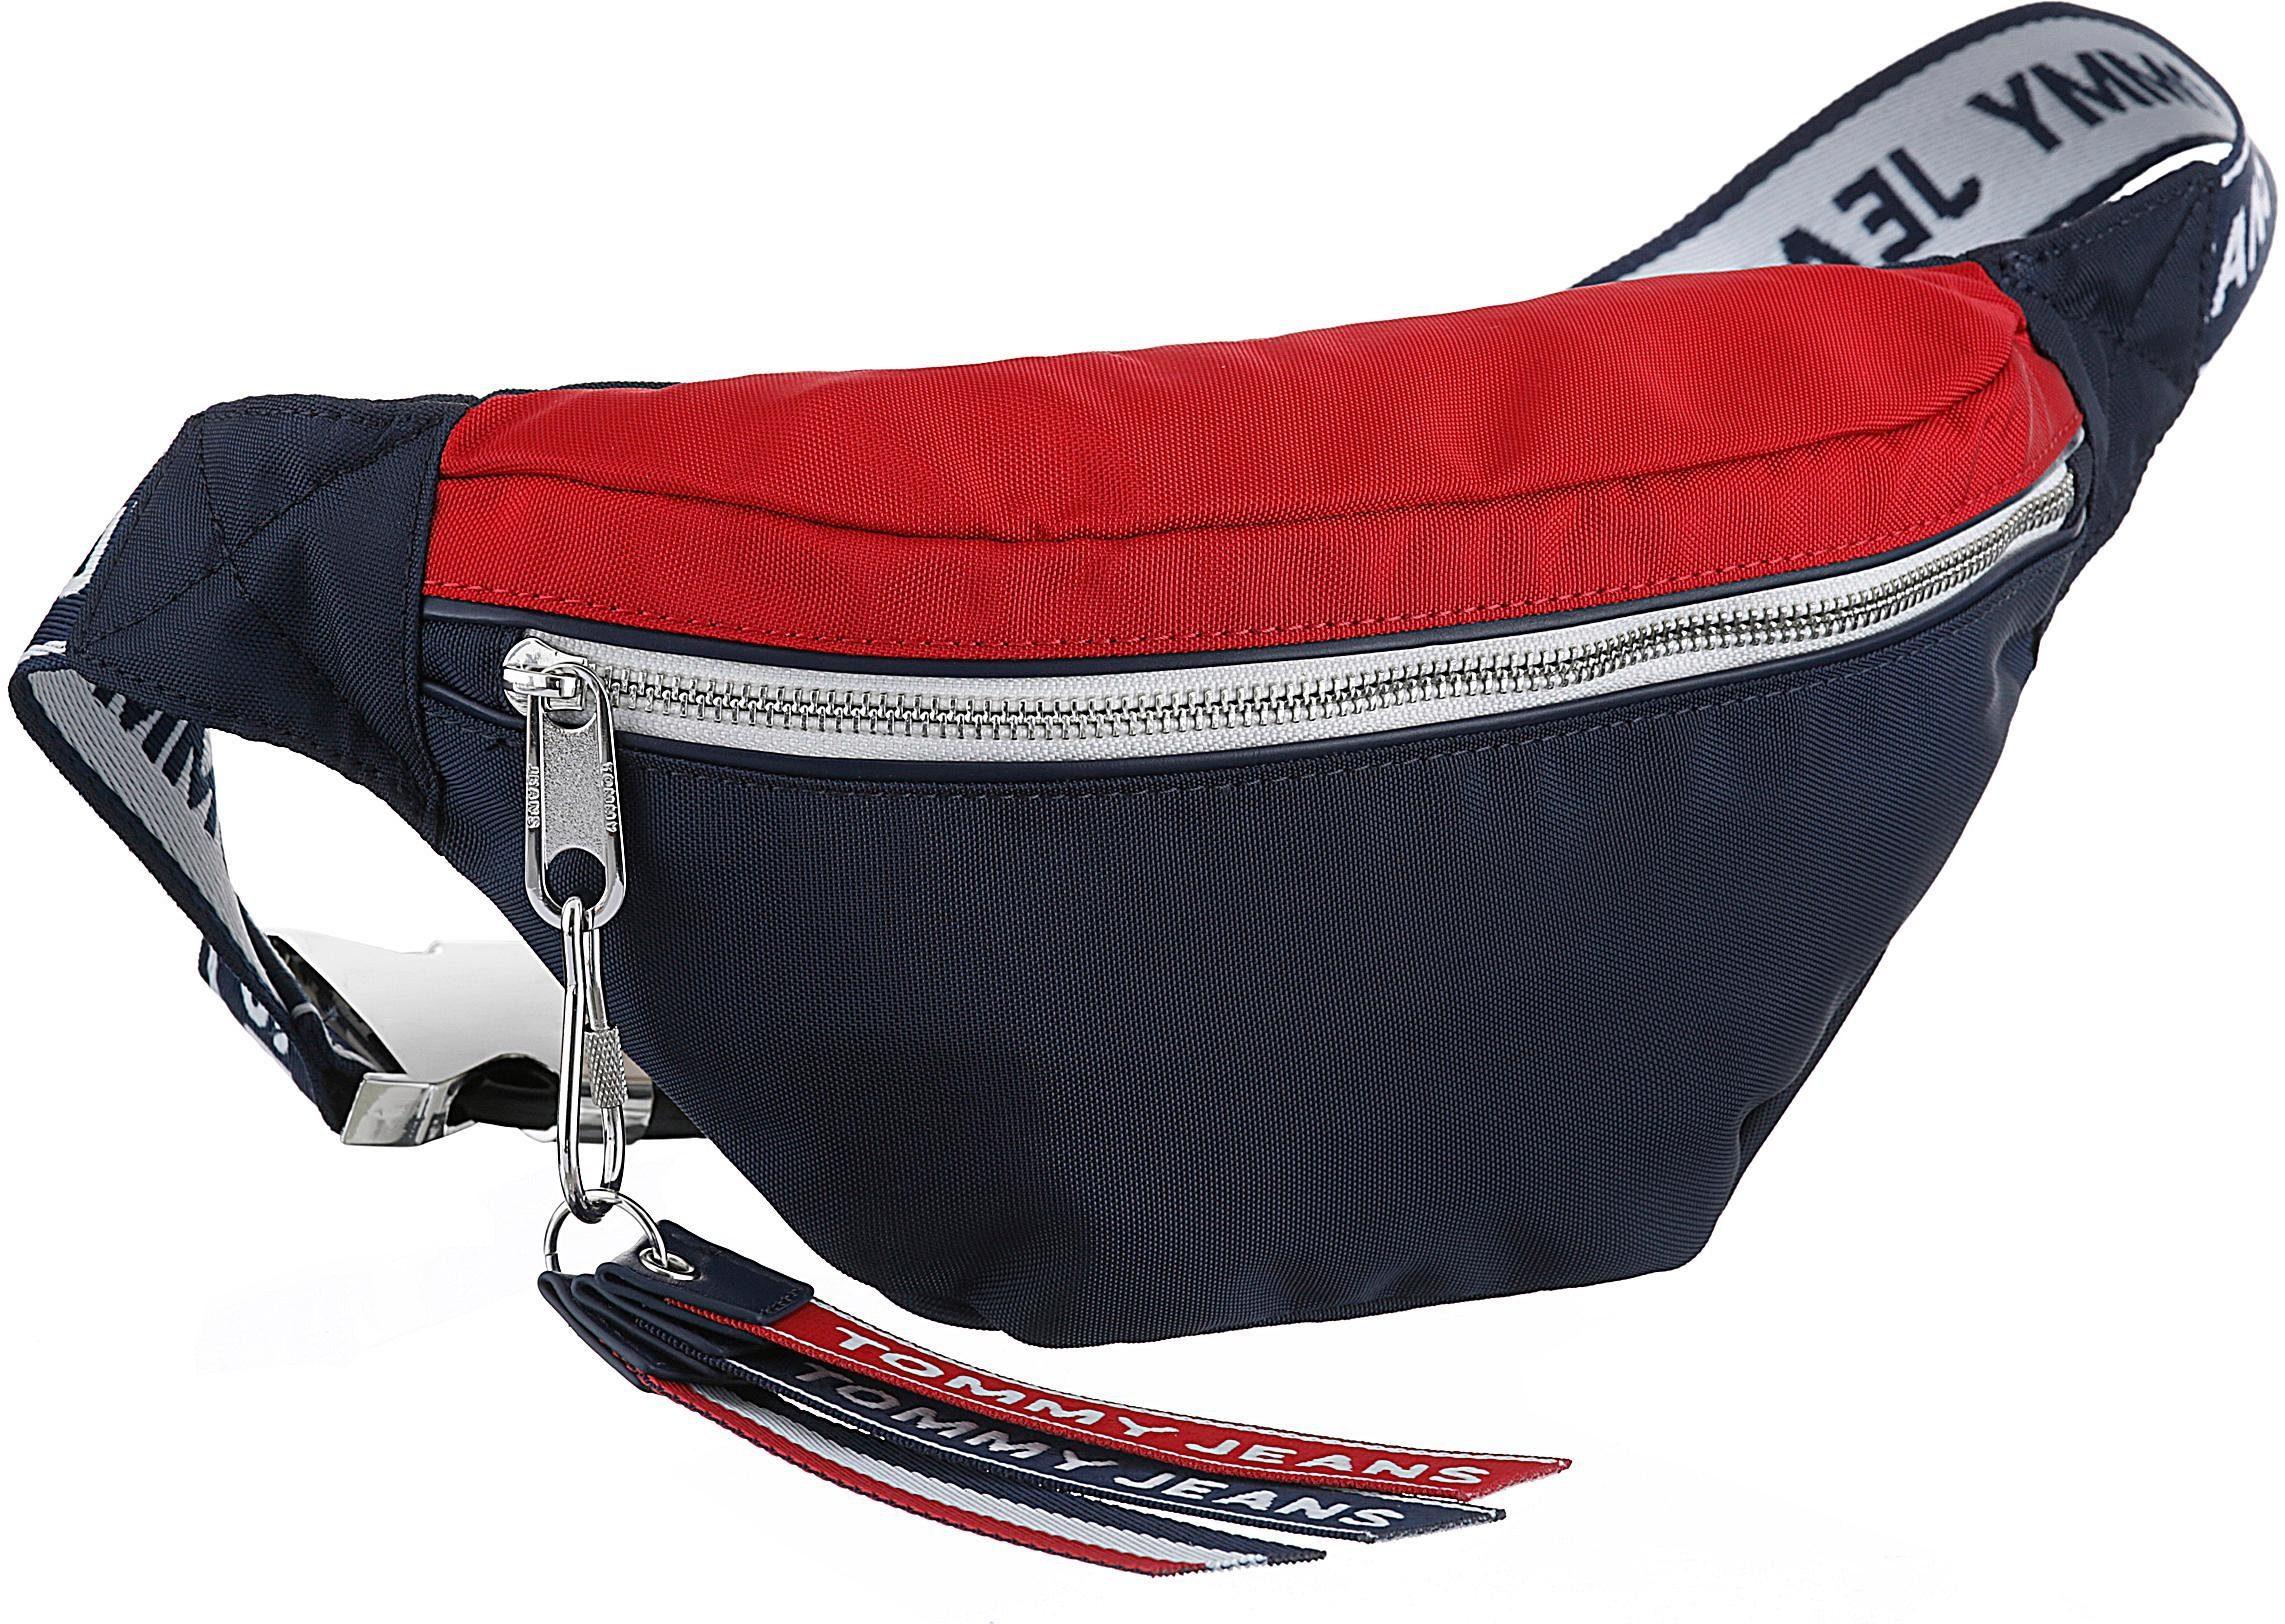 Auch Tommy Crossbody Jeans Kann Bumbag« »tju Werden Gürteltasche Bag Getragen Als Tape Logo xp46RqHUp